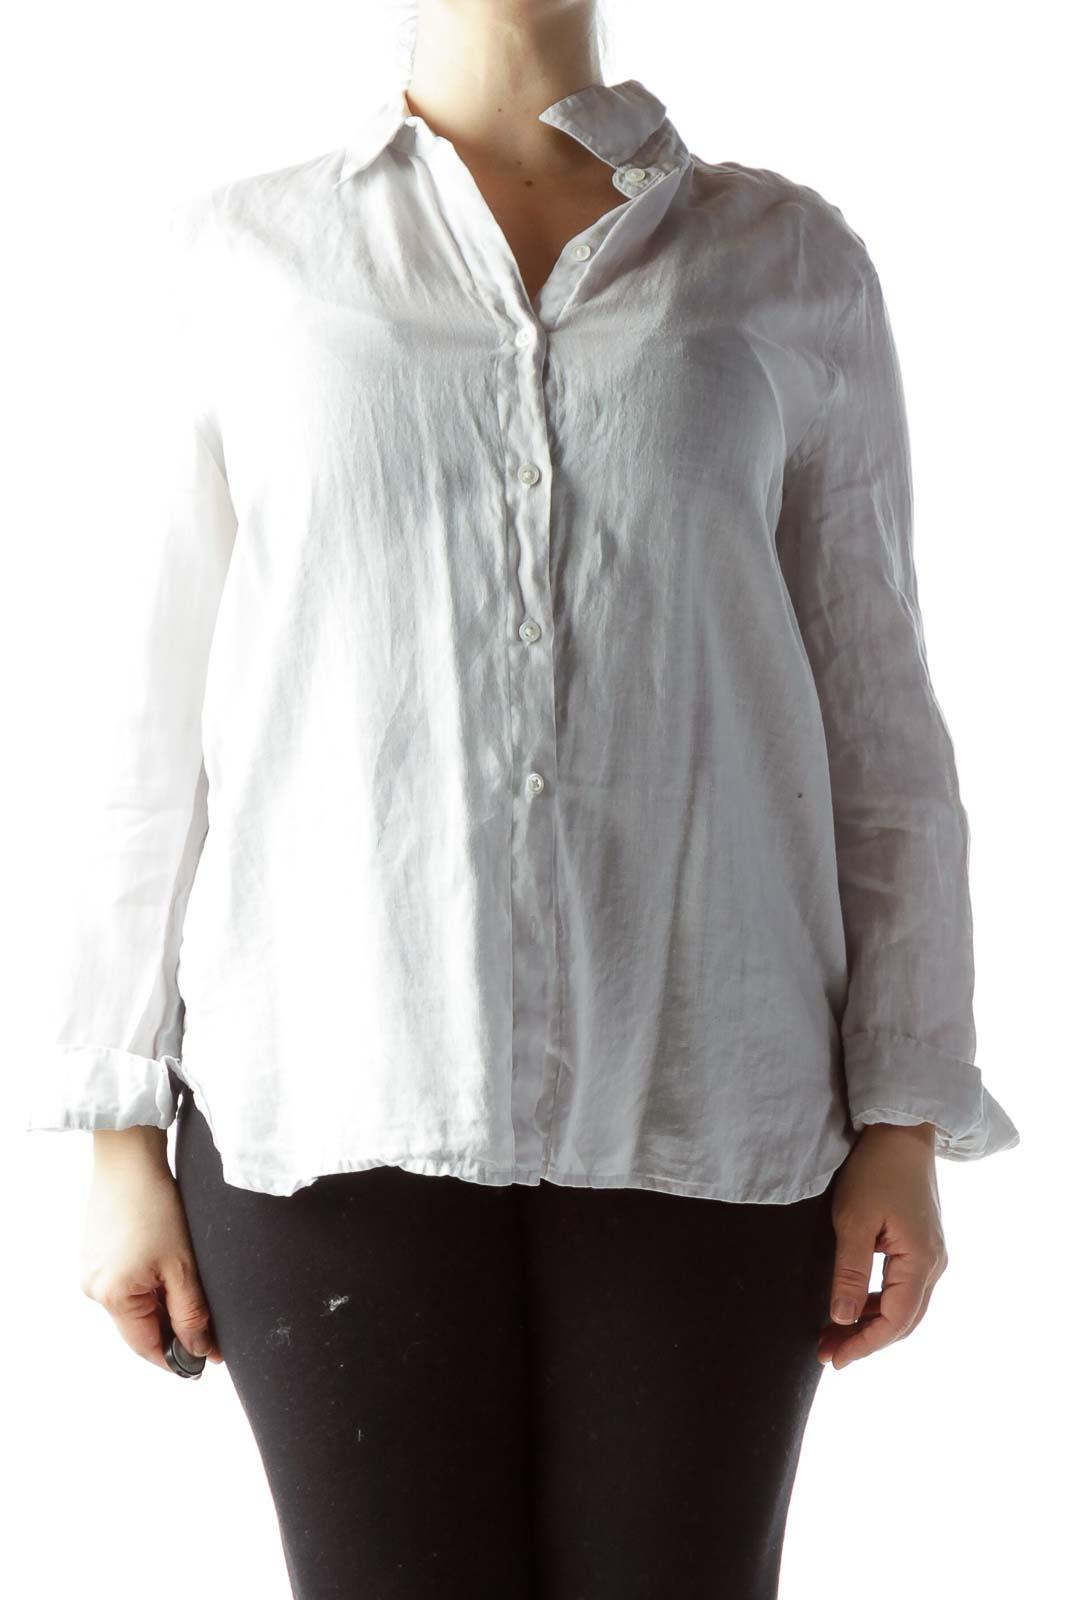 Beige Collared Buttoned Long Sleeve Knit 100% Linen Shirt Front